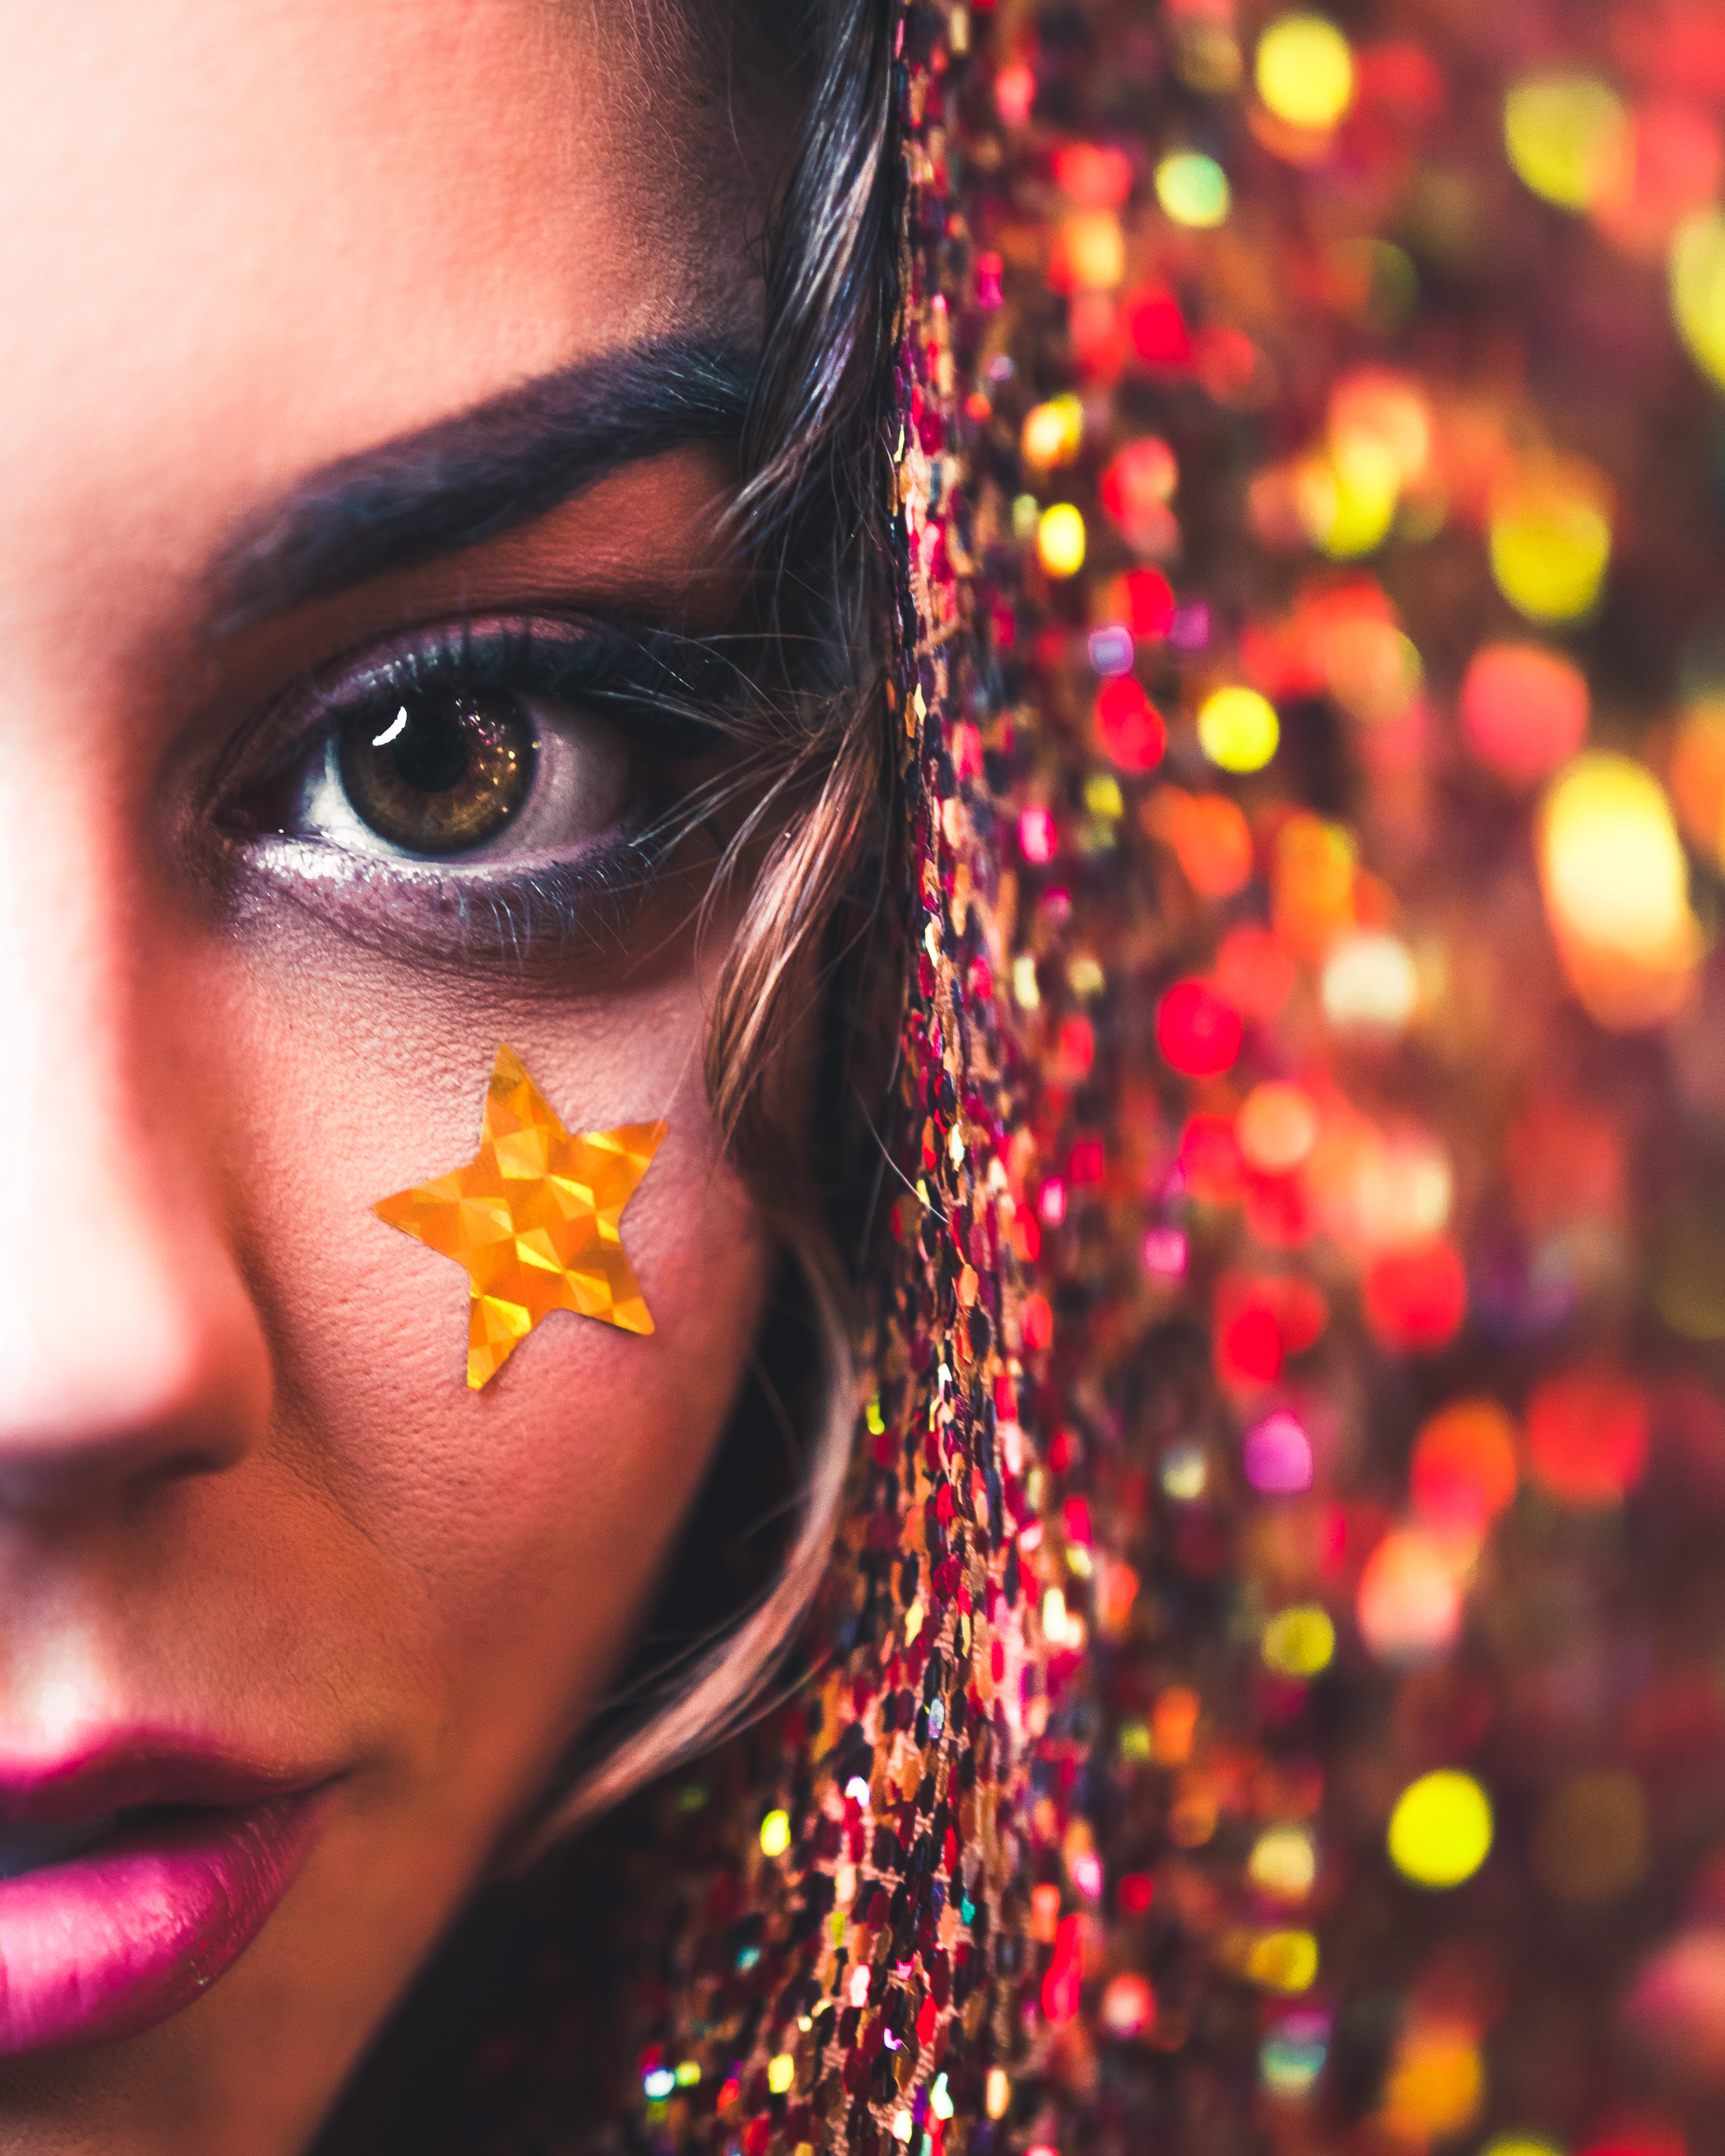 Star being